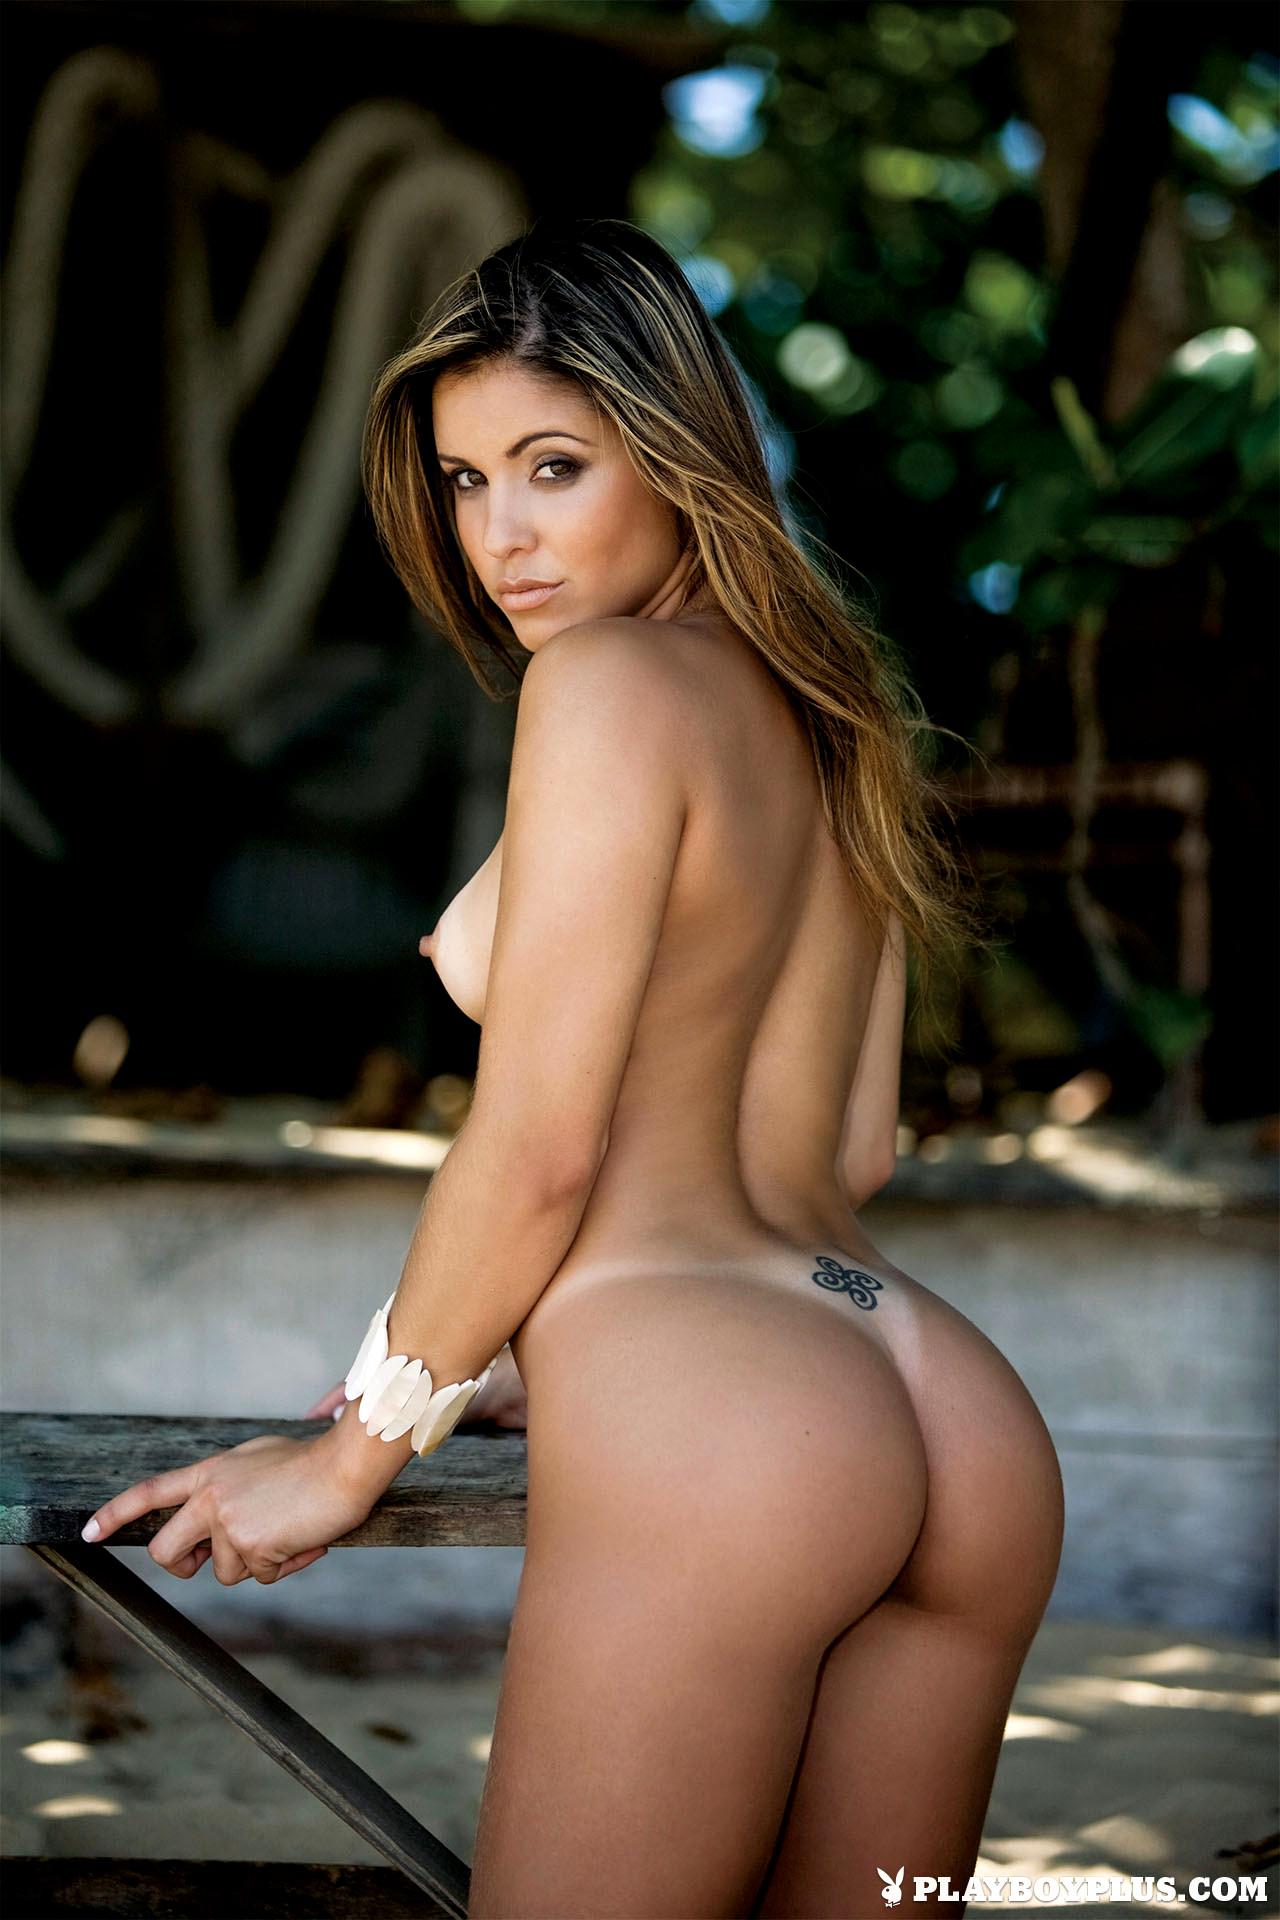 Babe Today Playboy Plus Marcella Matos Underground Babe-pic337